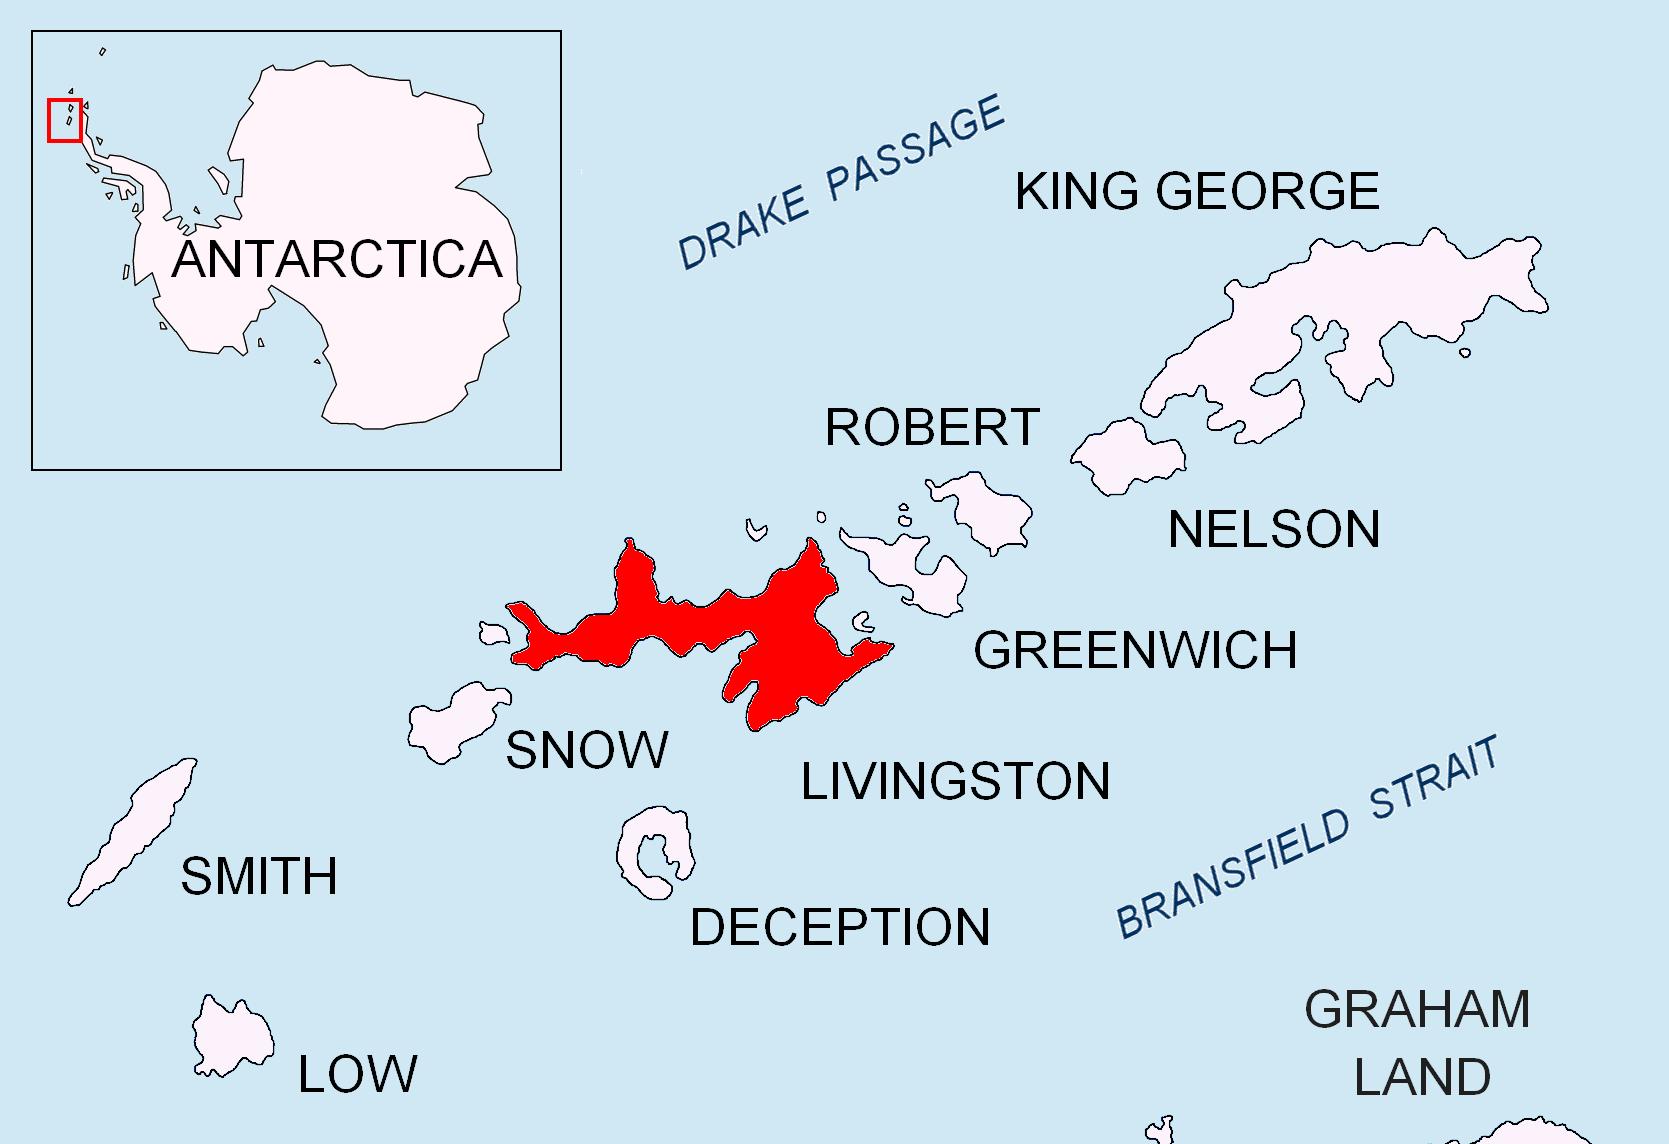 Mappa dell'isola Livingstone - Isole Shetland meridionali